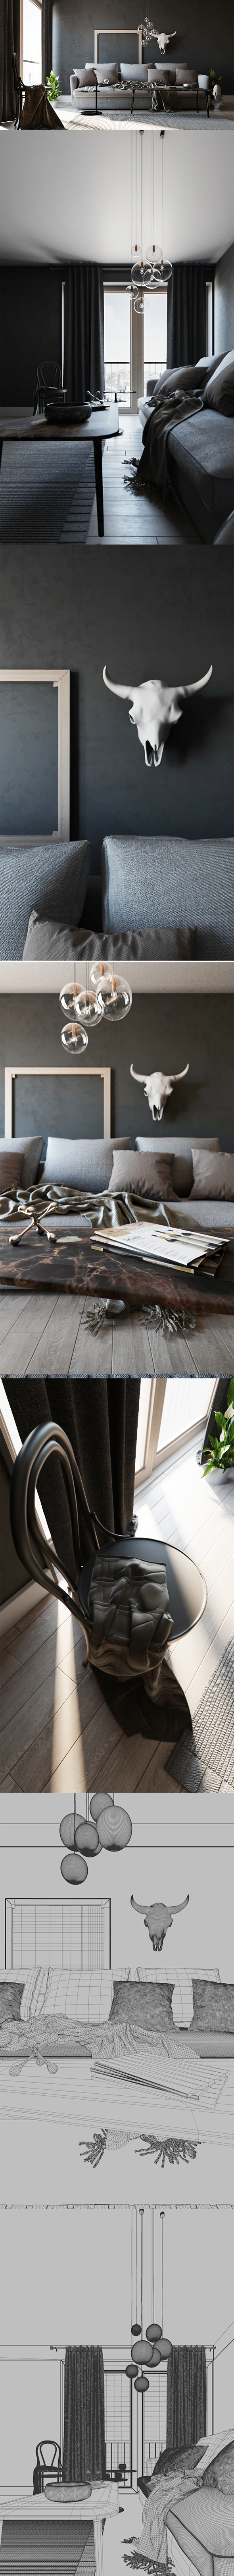 Simple Interior Scene - Corona. 3D model and objects for room 3D modelling. #3D #3DModel #3DDesign #3DScene #render #3dsmax #chair #cinema4d #corona #curtain #design #family #furniture #houseware #interior #living #LivingRoom #natural #nature #realistic #room #sofa #window